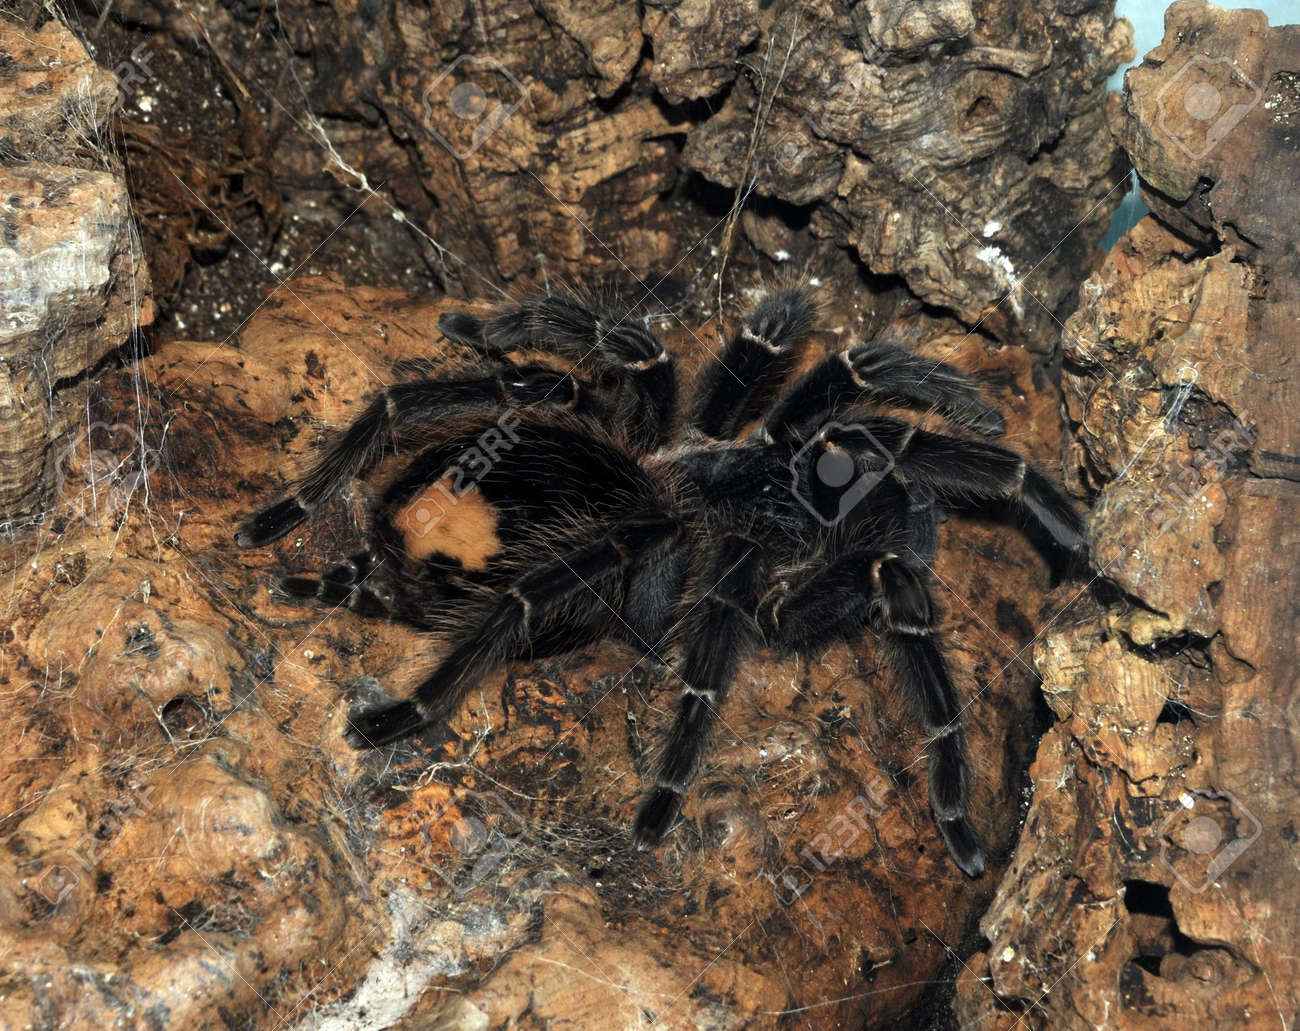 Closeup View Of Giant Tarantula Spider On A Rock